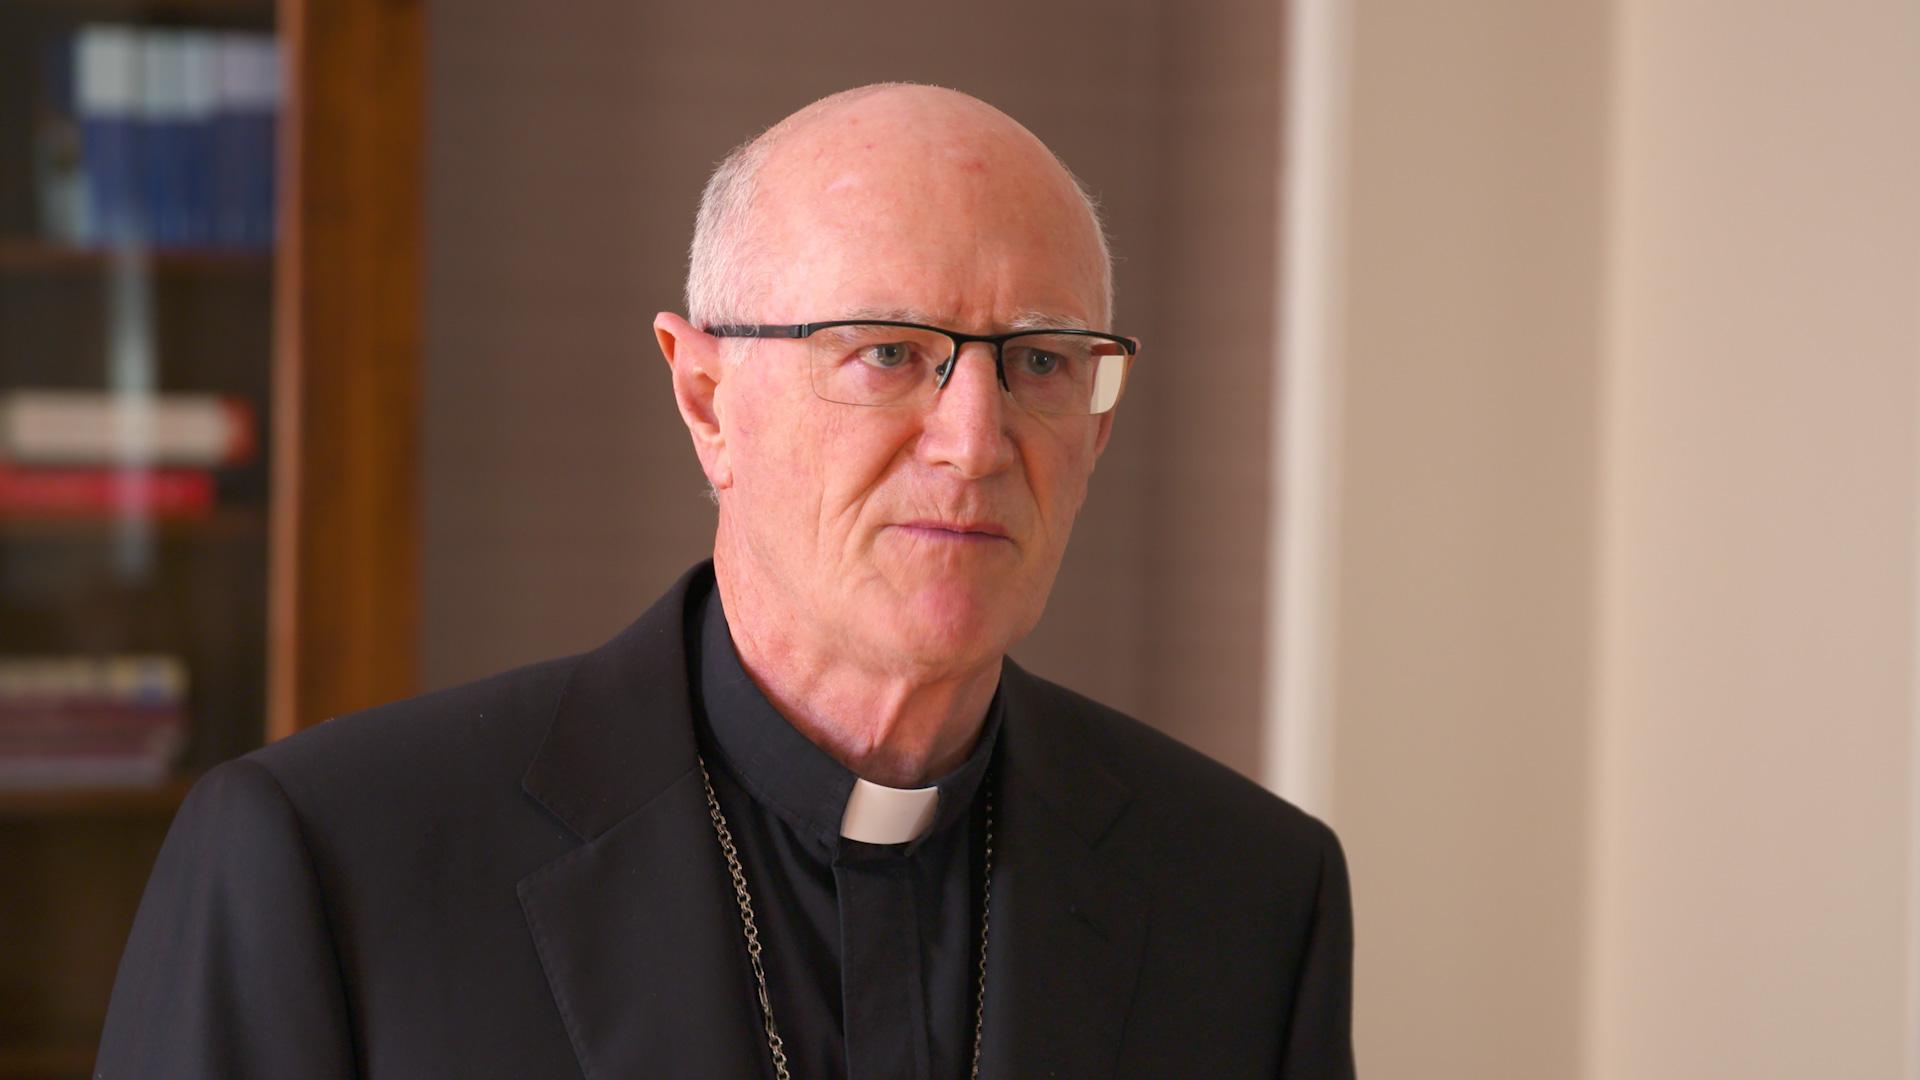 CPSMA 2021 Virtual AGM – Address by Archbishop Dermot Farrell